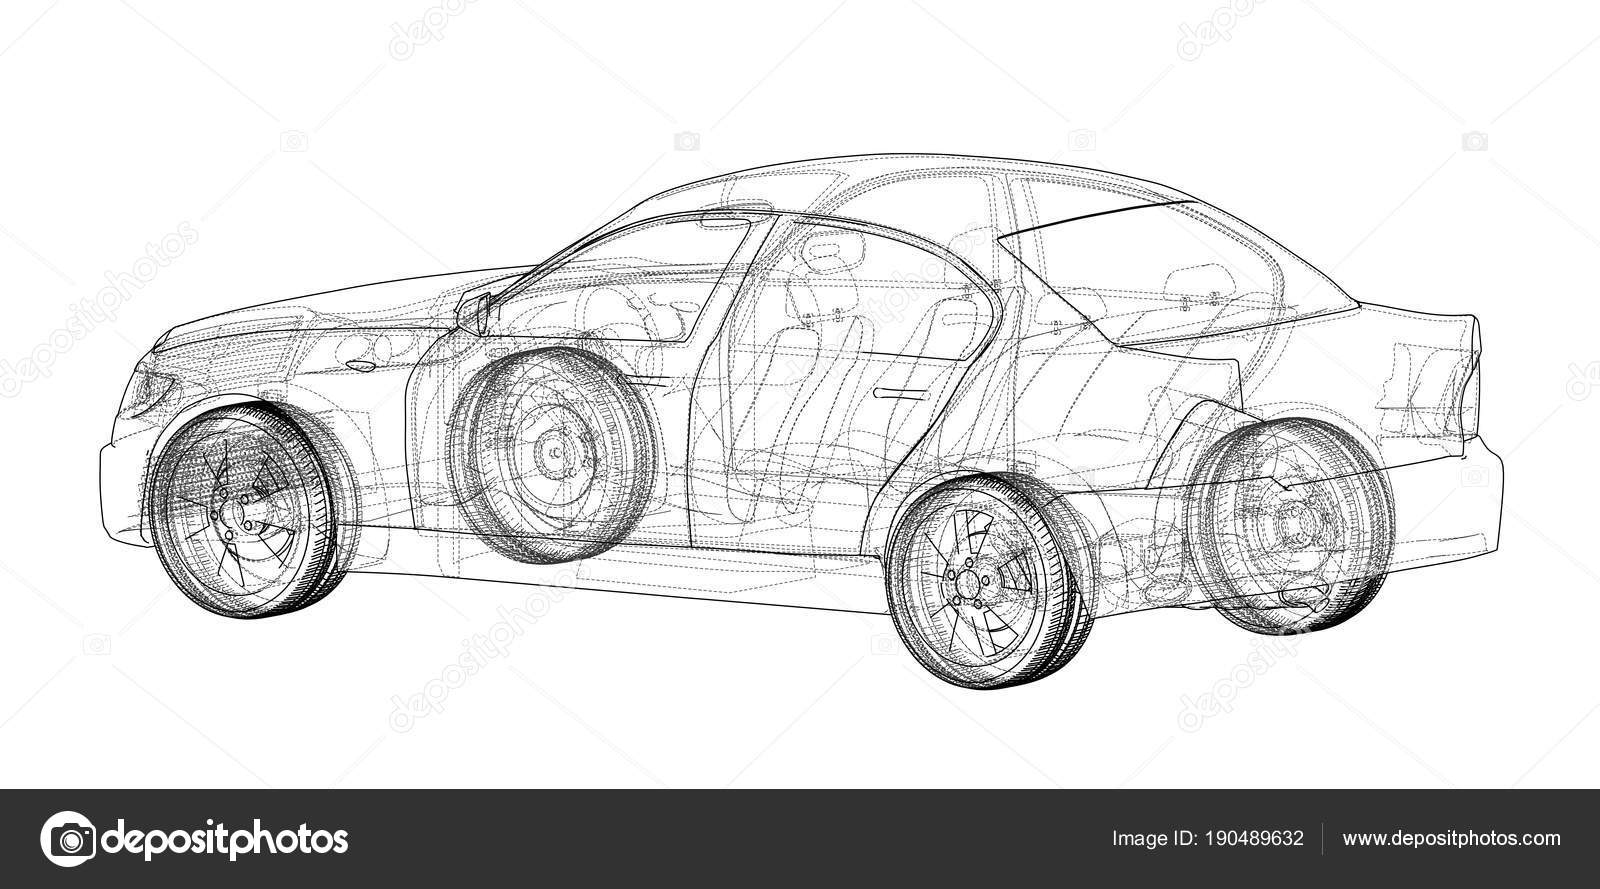 Concept car blueprint stock photo cherezoff 190489632 concept car blueprint stock photo malvernweather Images